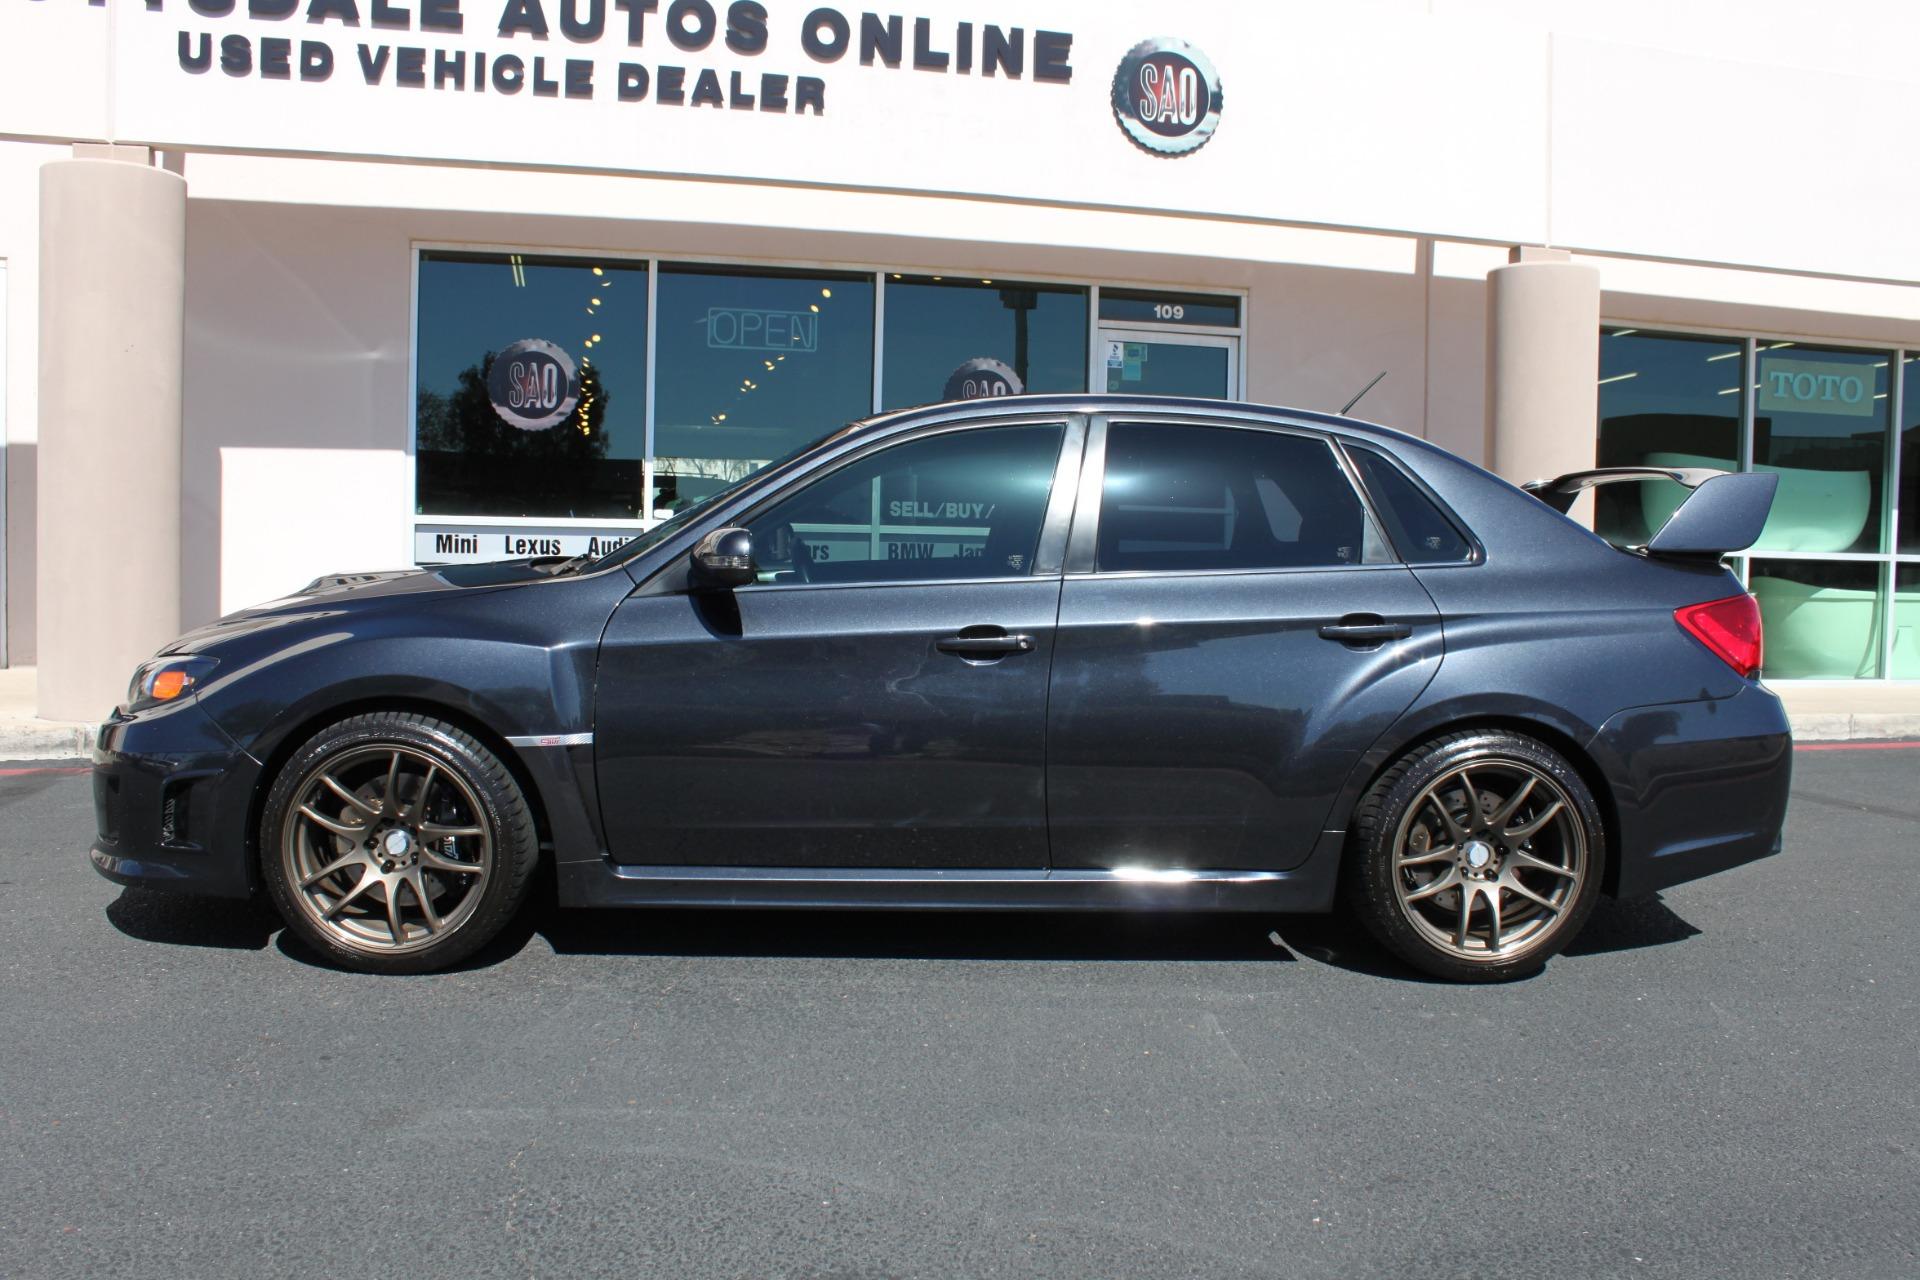 Used-2011-Subaru-Impreza-Sedan-WRX-STI-Wagoneer